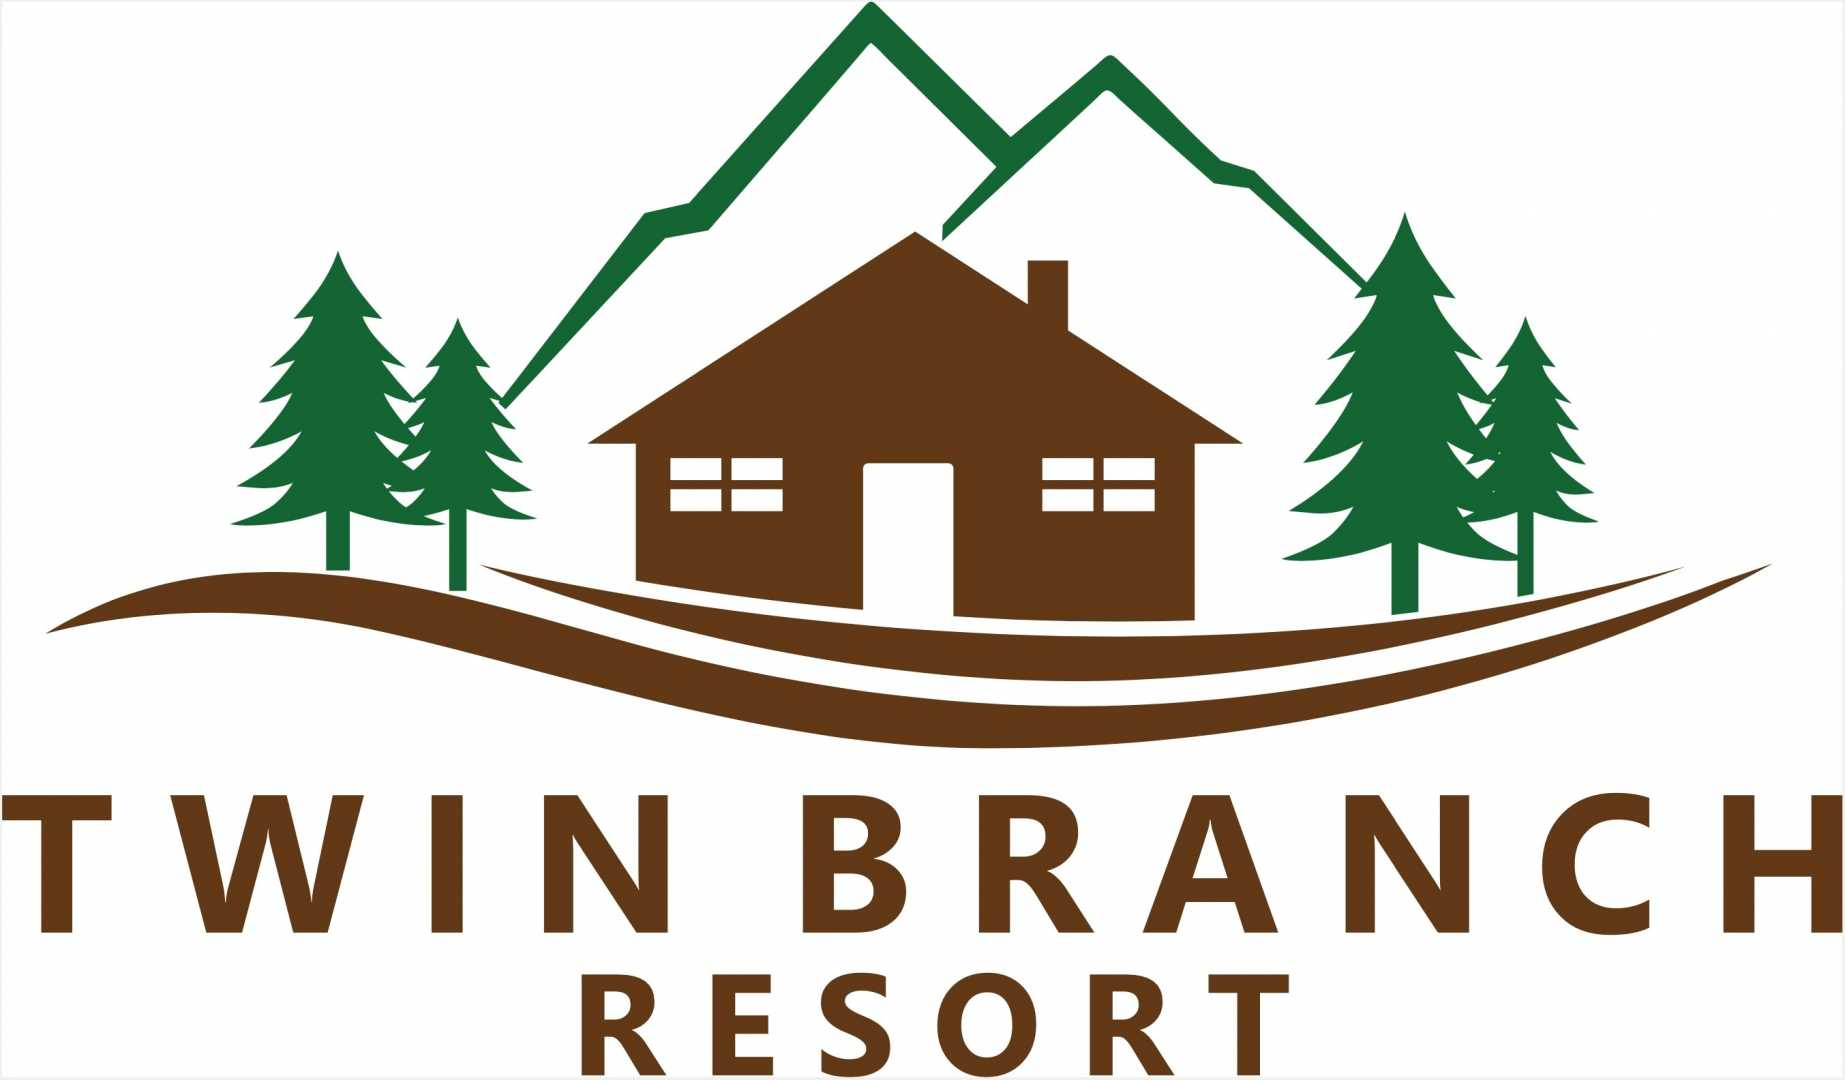 Twin Branch Resort Listing Photo 2021